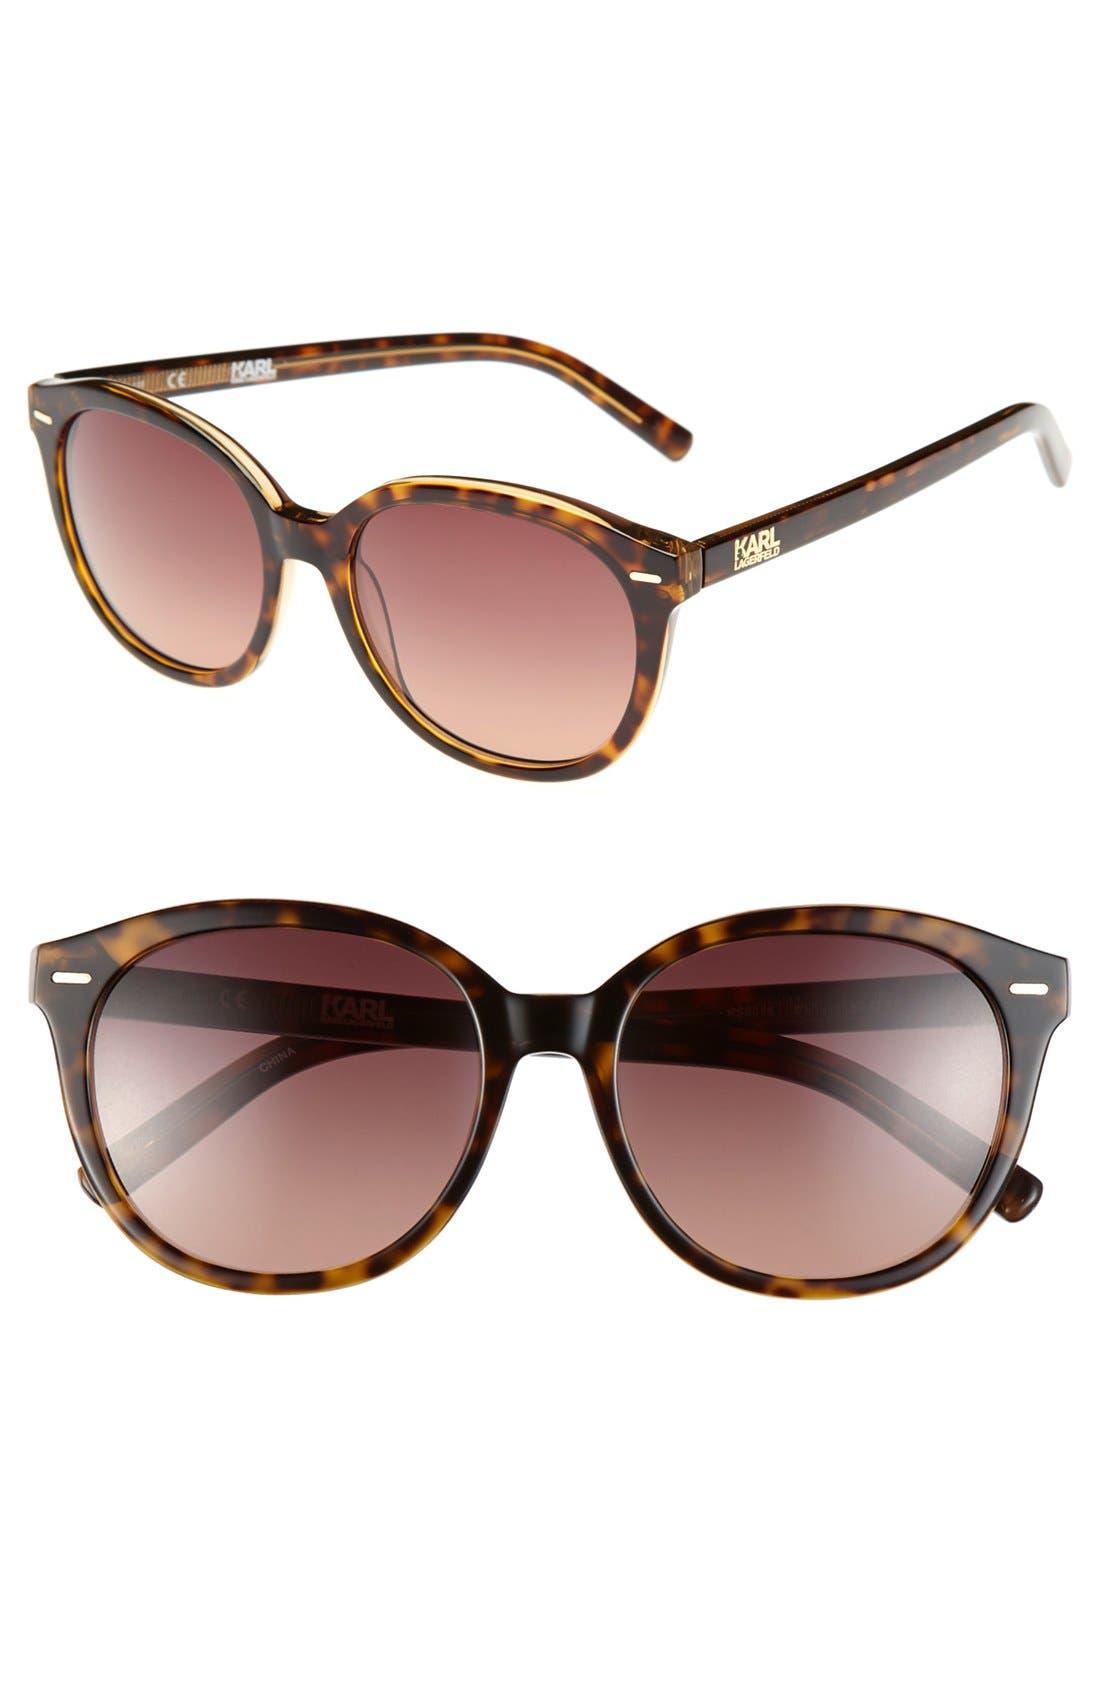 Main Image - Karl Lagerfeld 52mm Cat Eye Sunglasses